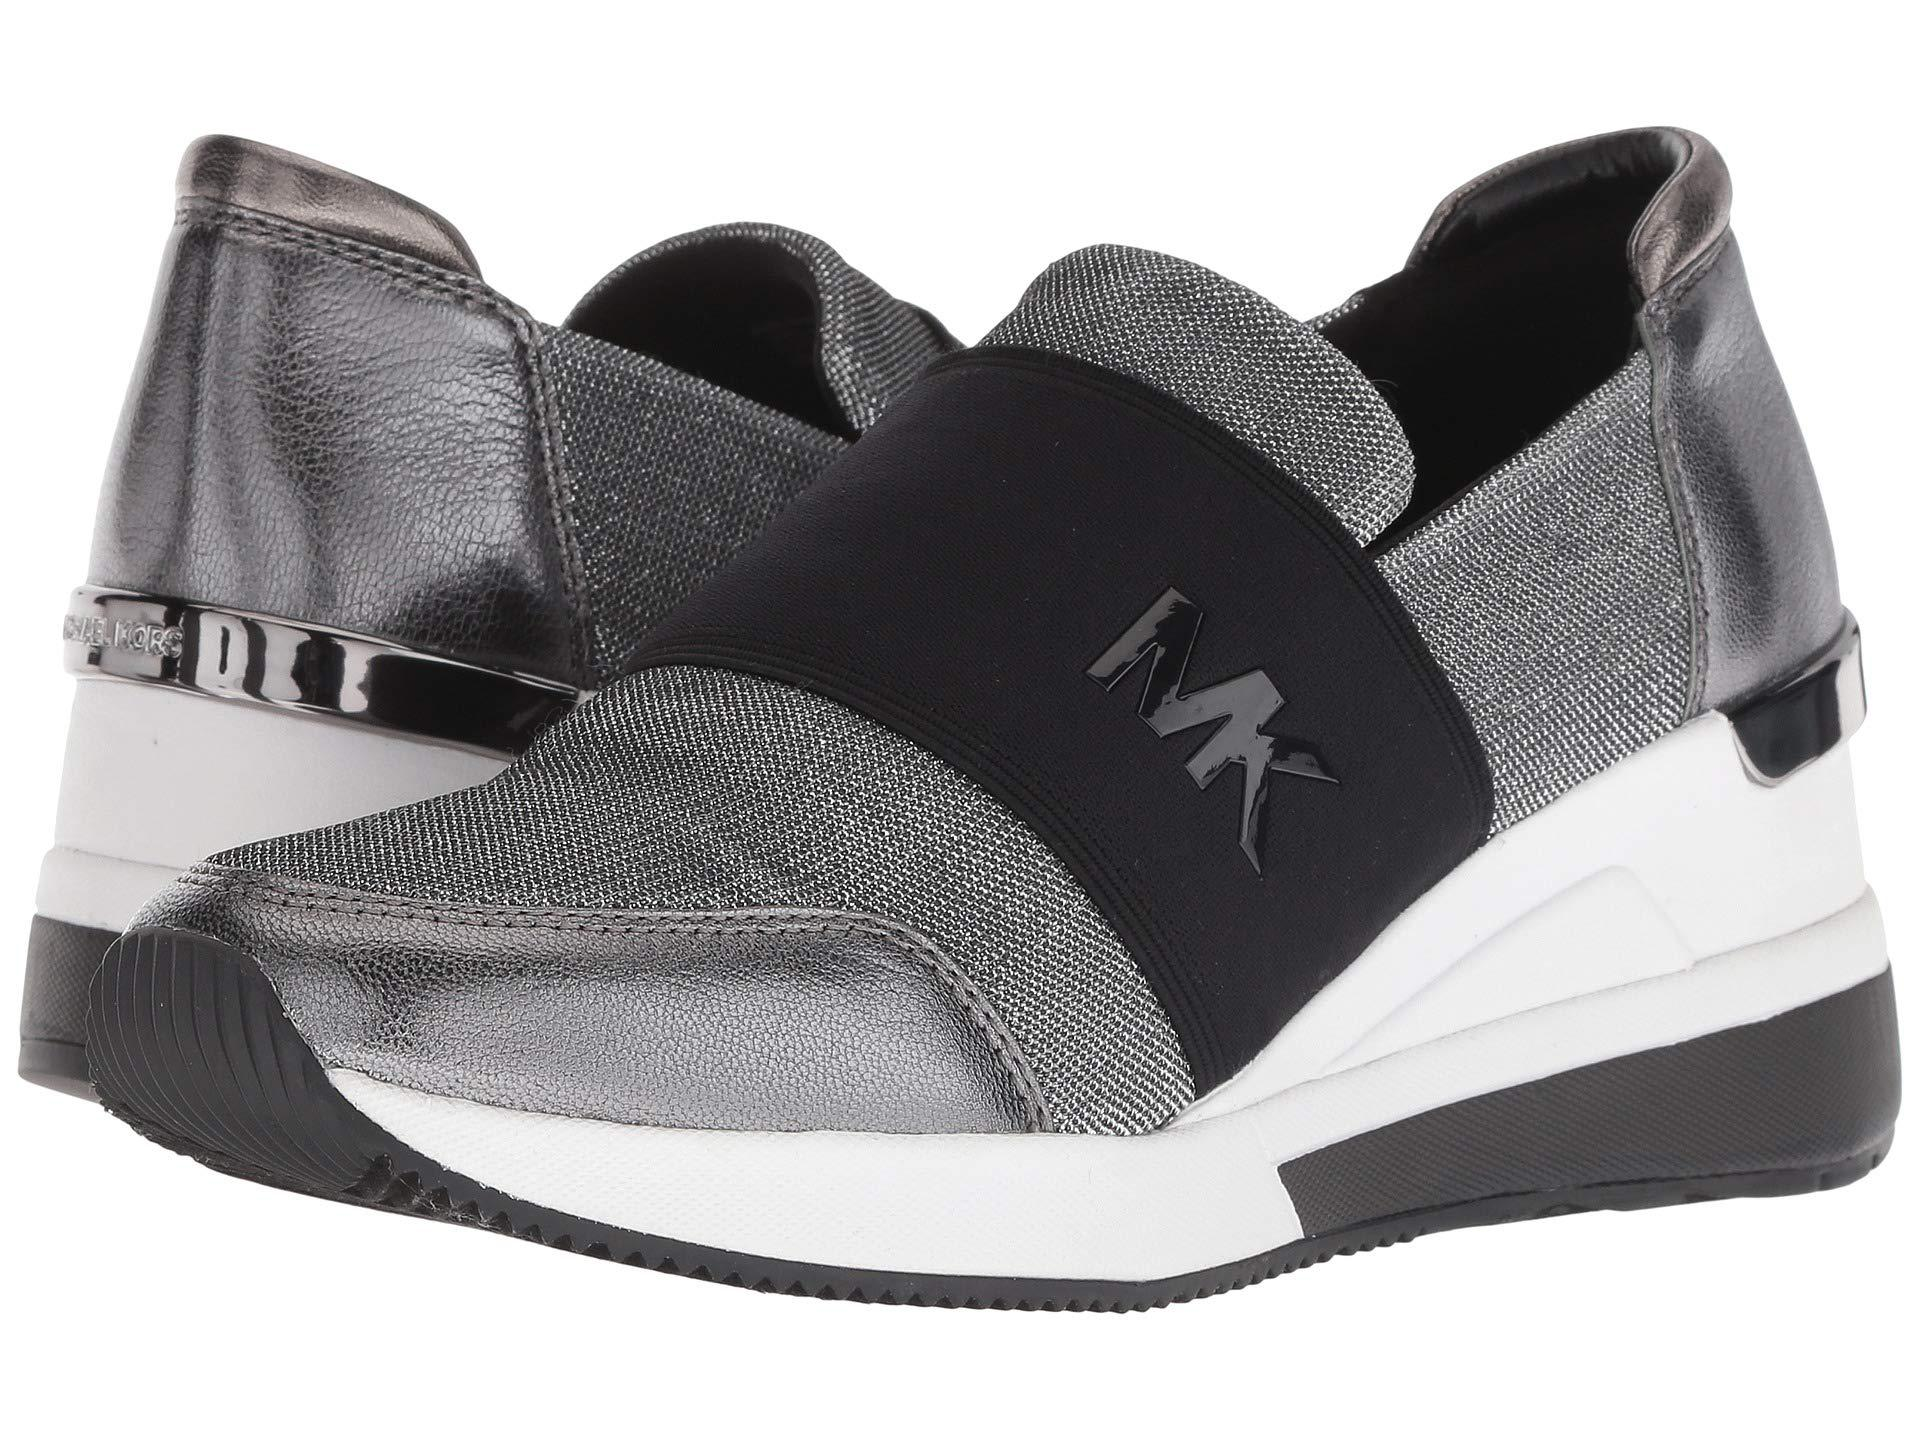 6ac1e19e7aba7 Lyst - MICHAEL Michael Kors Felix Trainer (black) Women s Shoes in Black